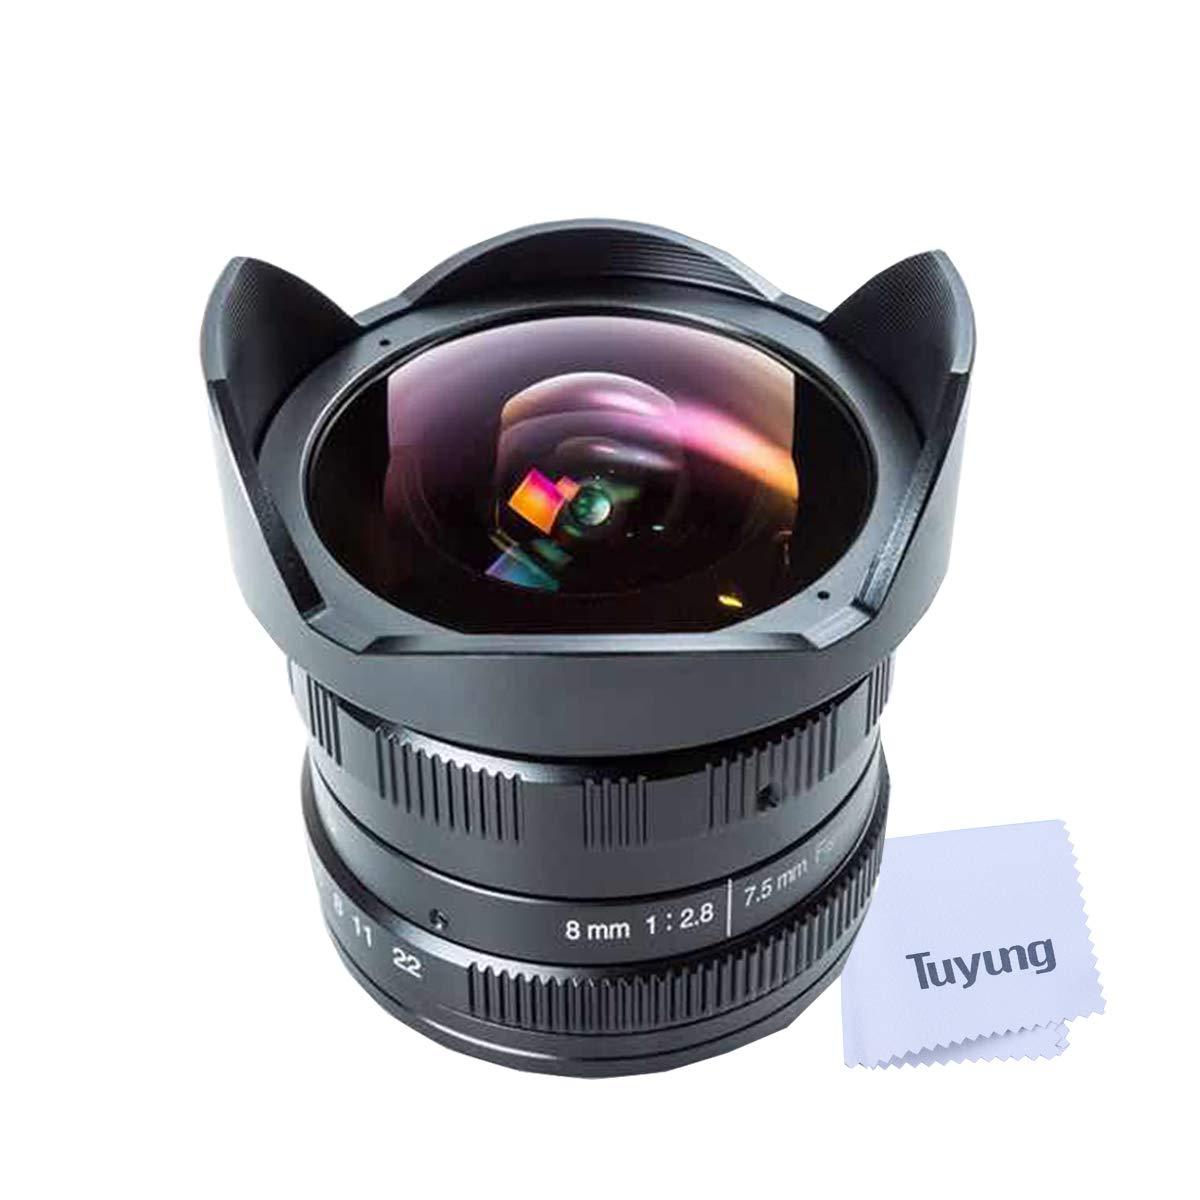 NEWYI 7.5mm f2.8 Manual Fisheye Lens Compatible for Panasonic Micro 4/3 Cameras G1 G5 G6 G7 GF1 GF2 GF5 GF6 GM1 GM5 GM10 GX7 GX8 GH1 GH3 GH4 and Olympus epm2 E-PL1 E-PL5 E-PL7 E-M1 E-M10 by TUYUNG